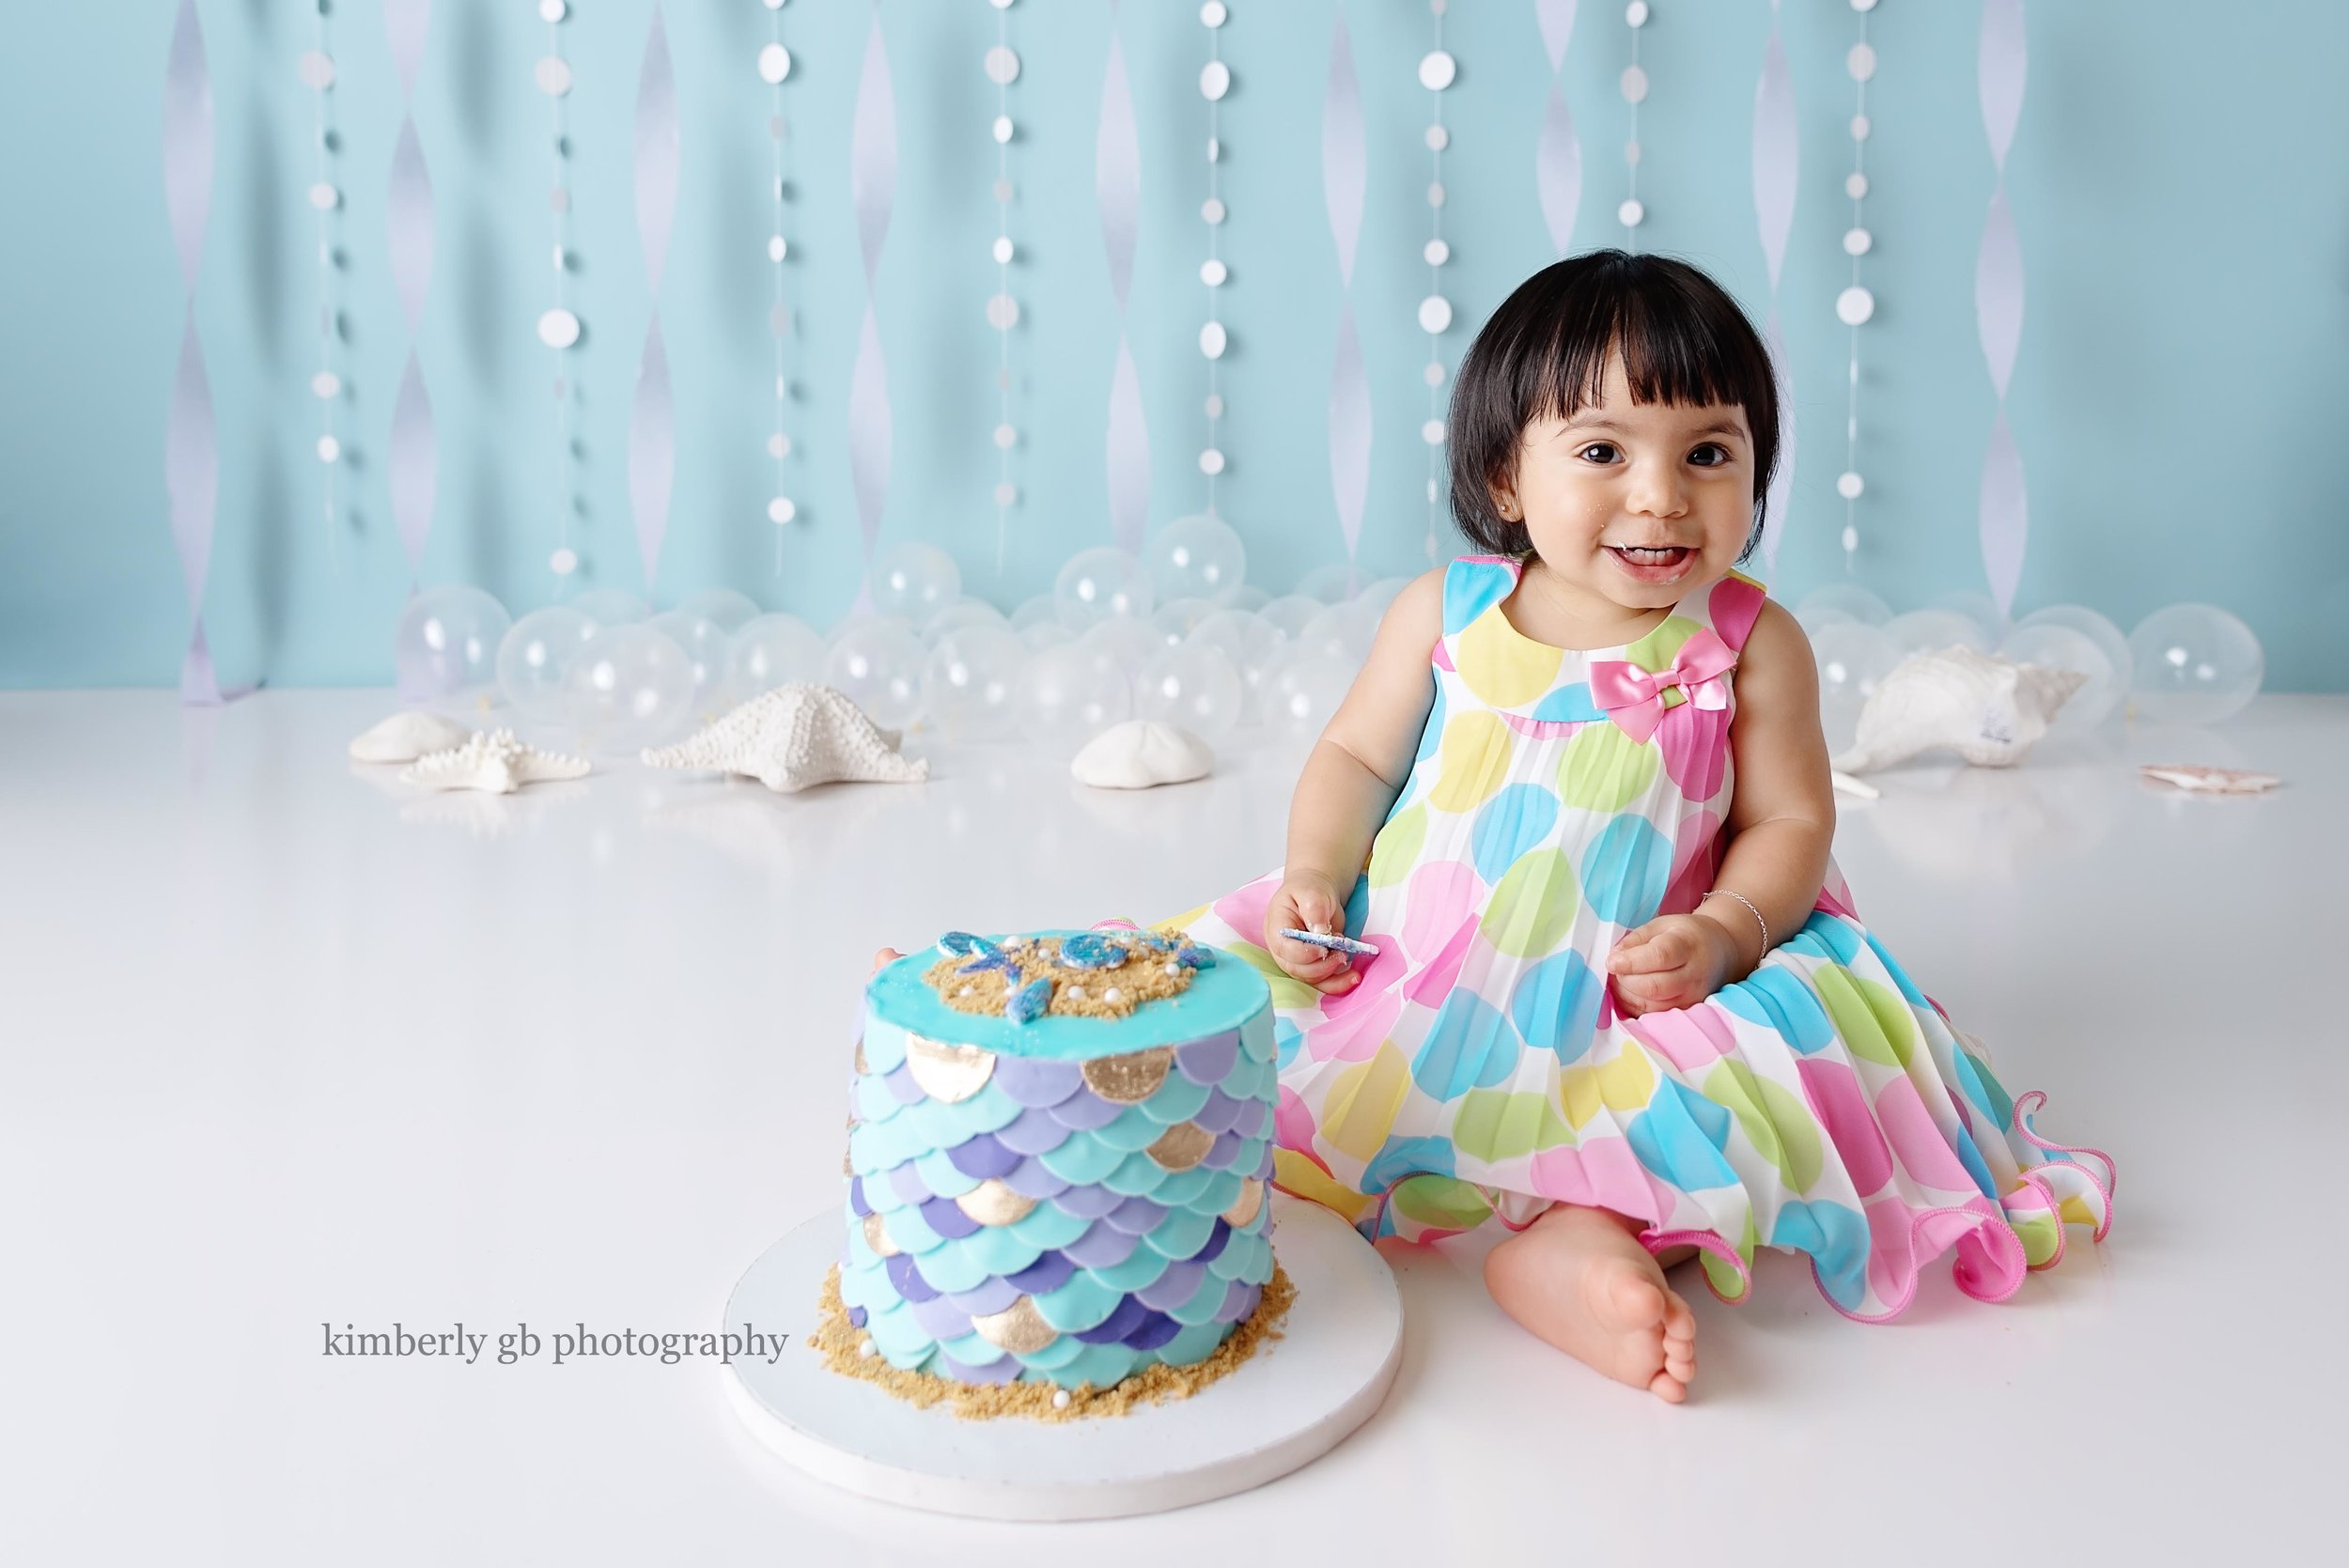 fotografia-de-ninos-primer-ano-anito-cake-smash-bizcocho-en-puerto-rico-kimberly-gb-photography-fotografa-164.jpg